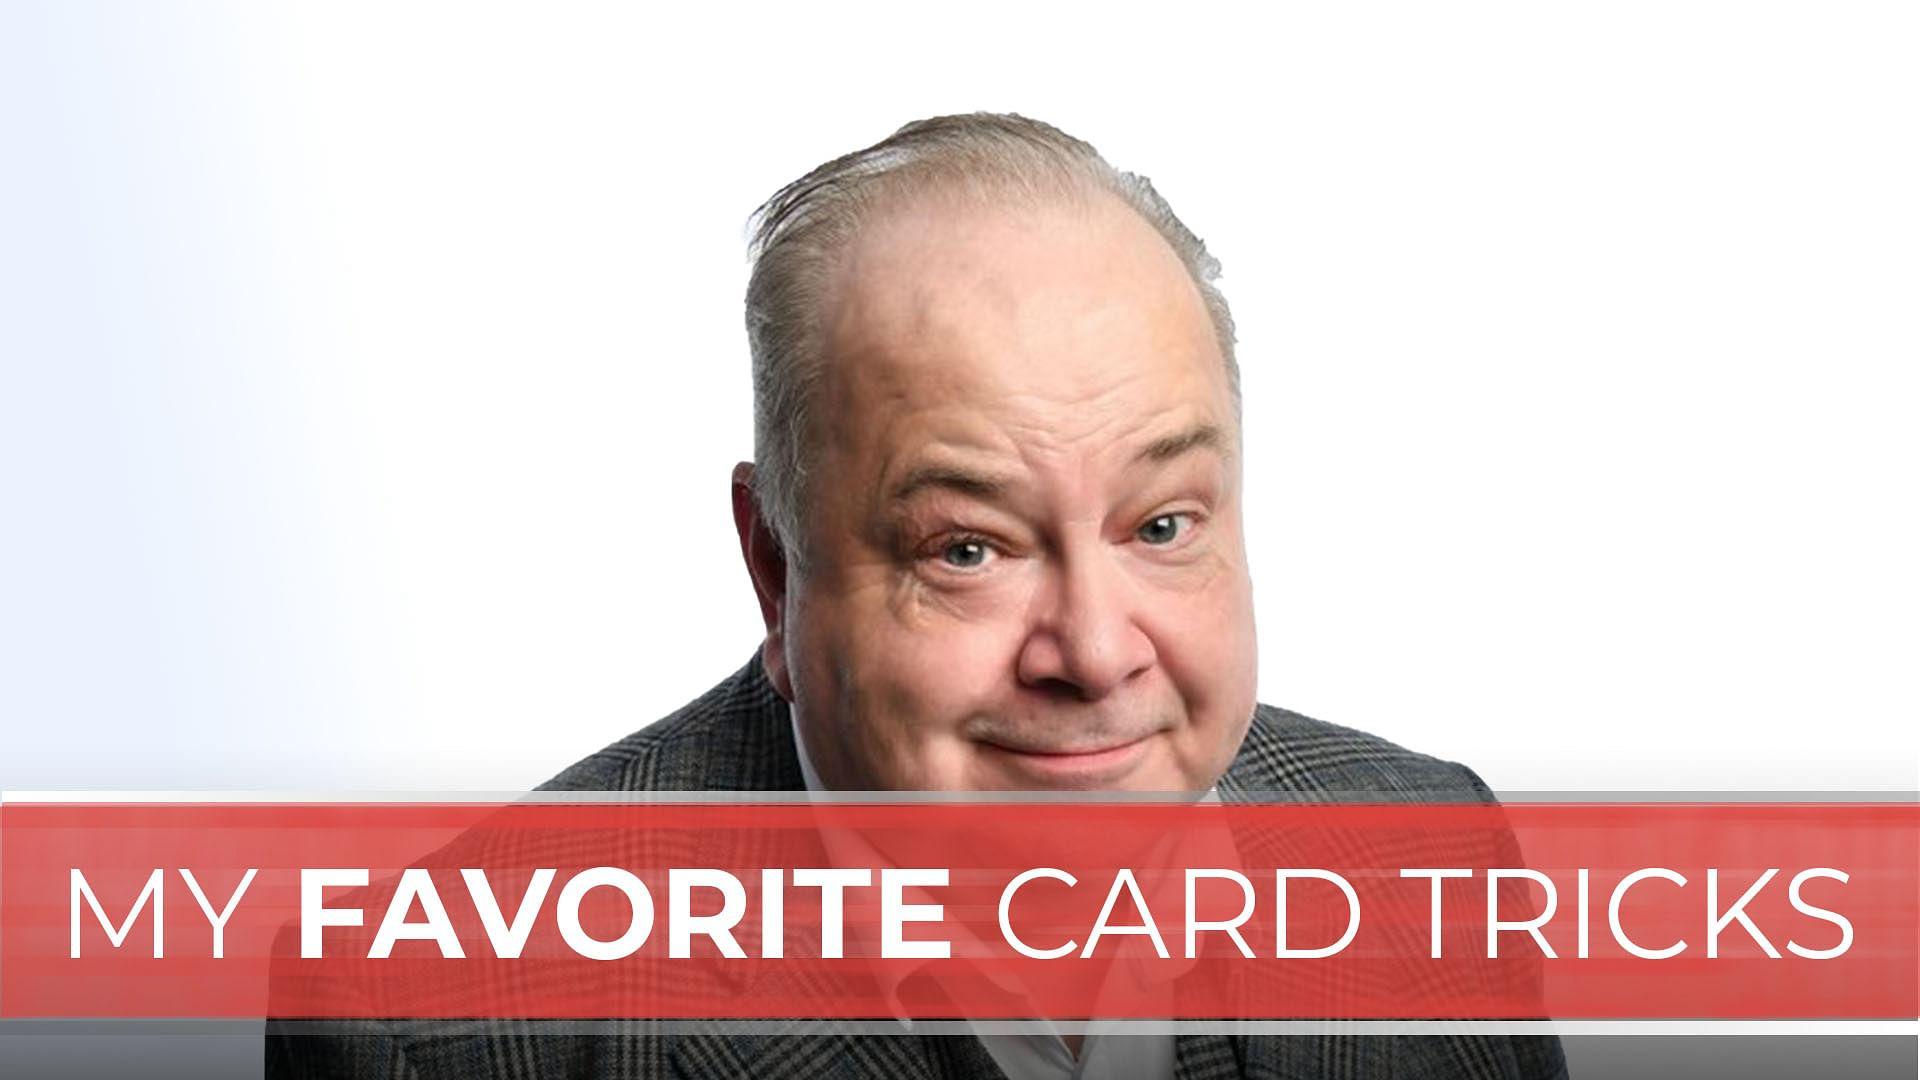 My Favorite Card Tricks: John Archer